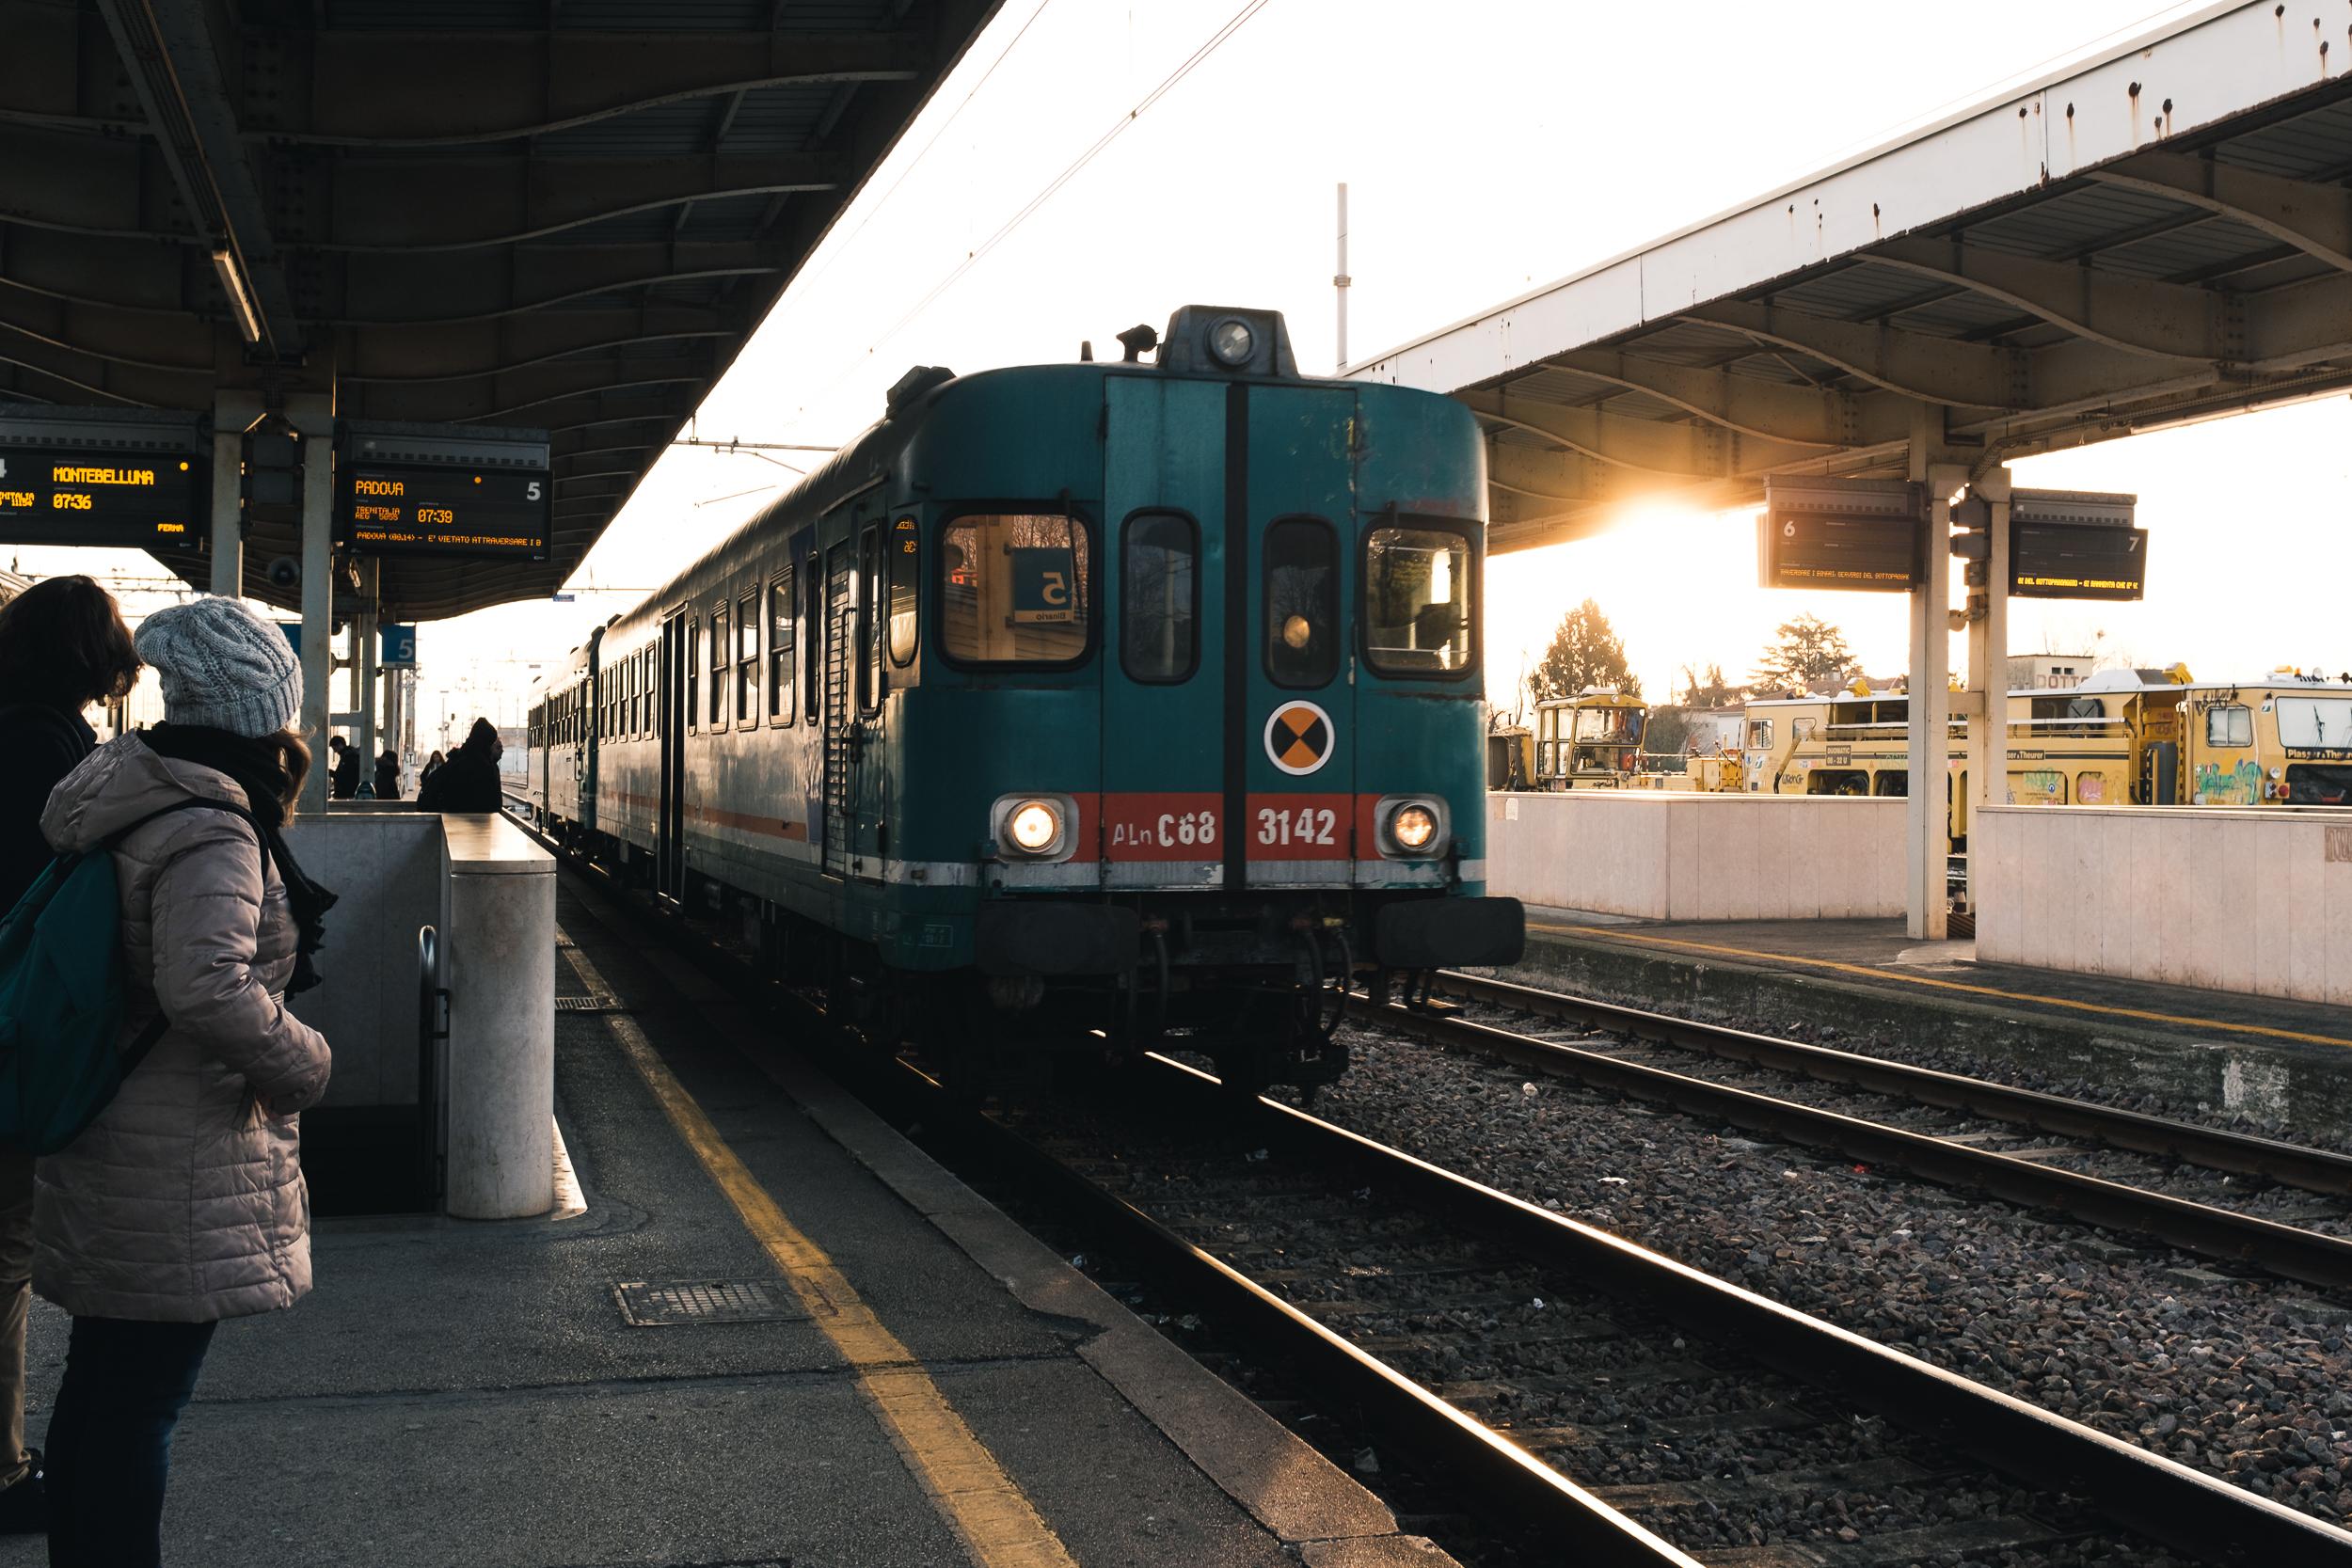 2018-02-24_Web_0042_Waiting for the train.jpg